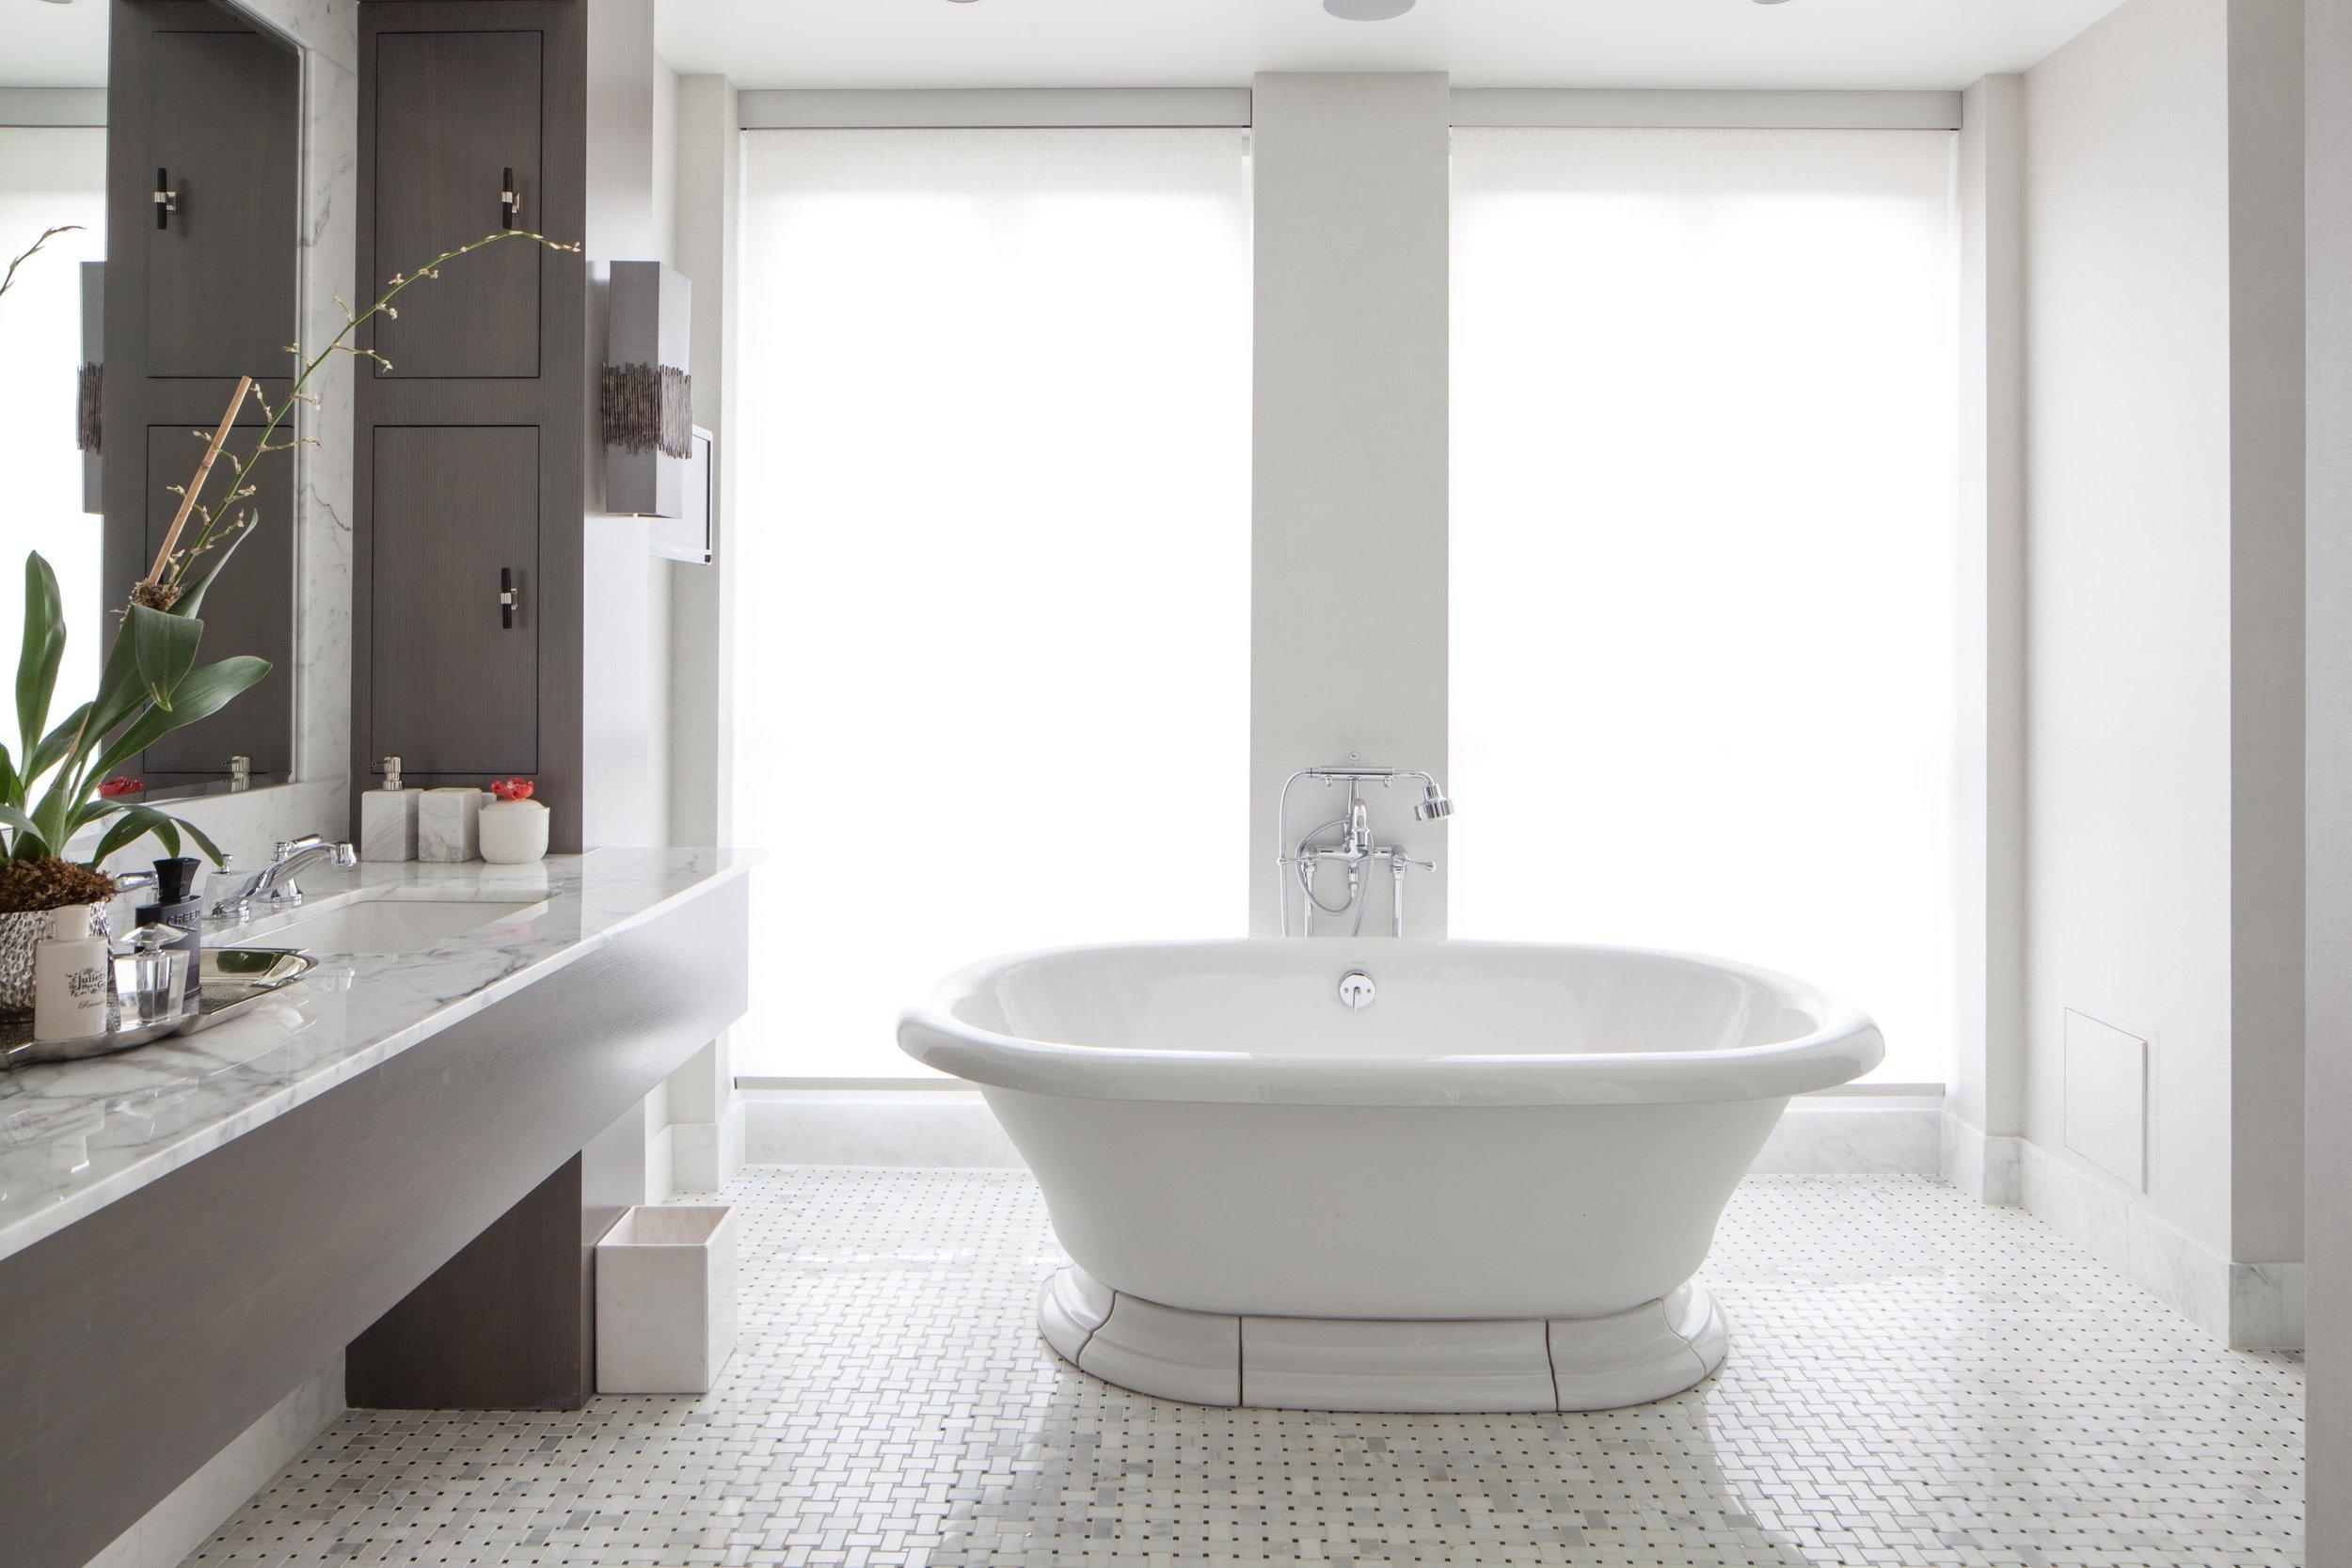 Jason_Bax_SQ_Architecture_Interior_Bathroom_MG_1946.jpg